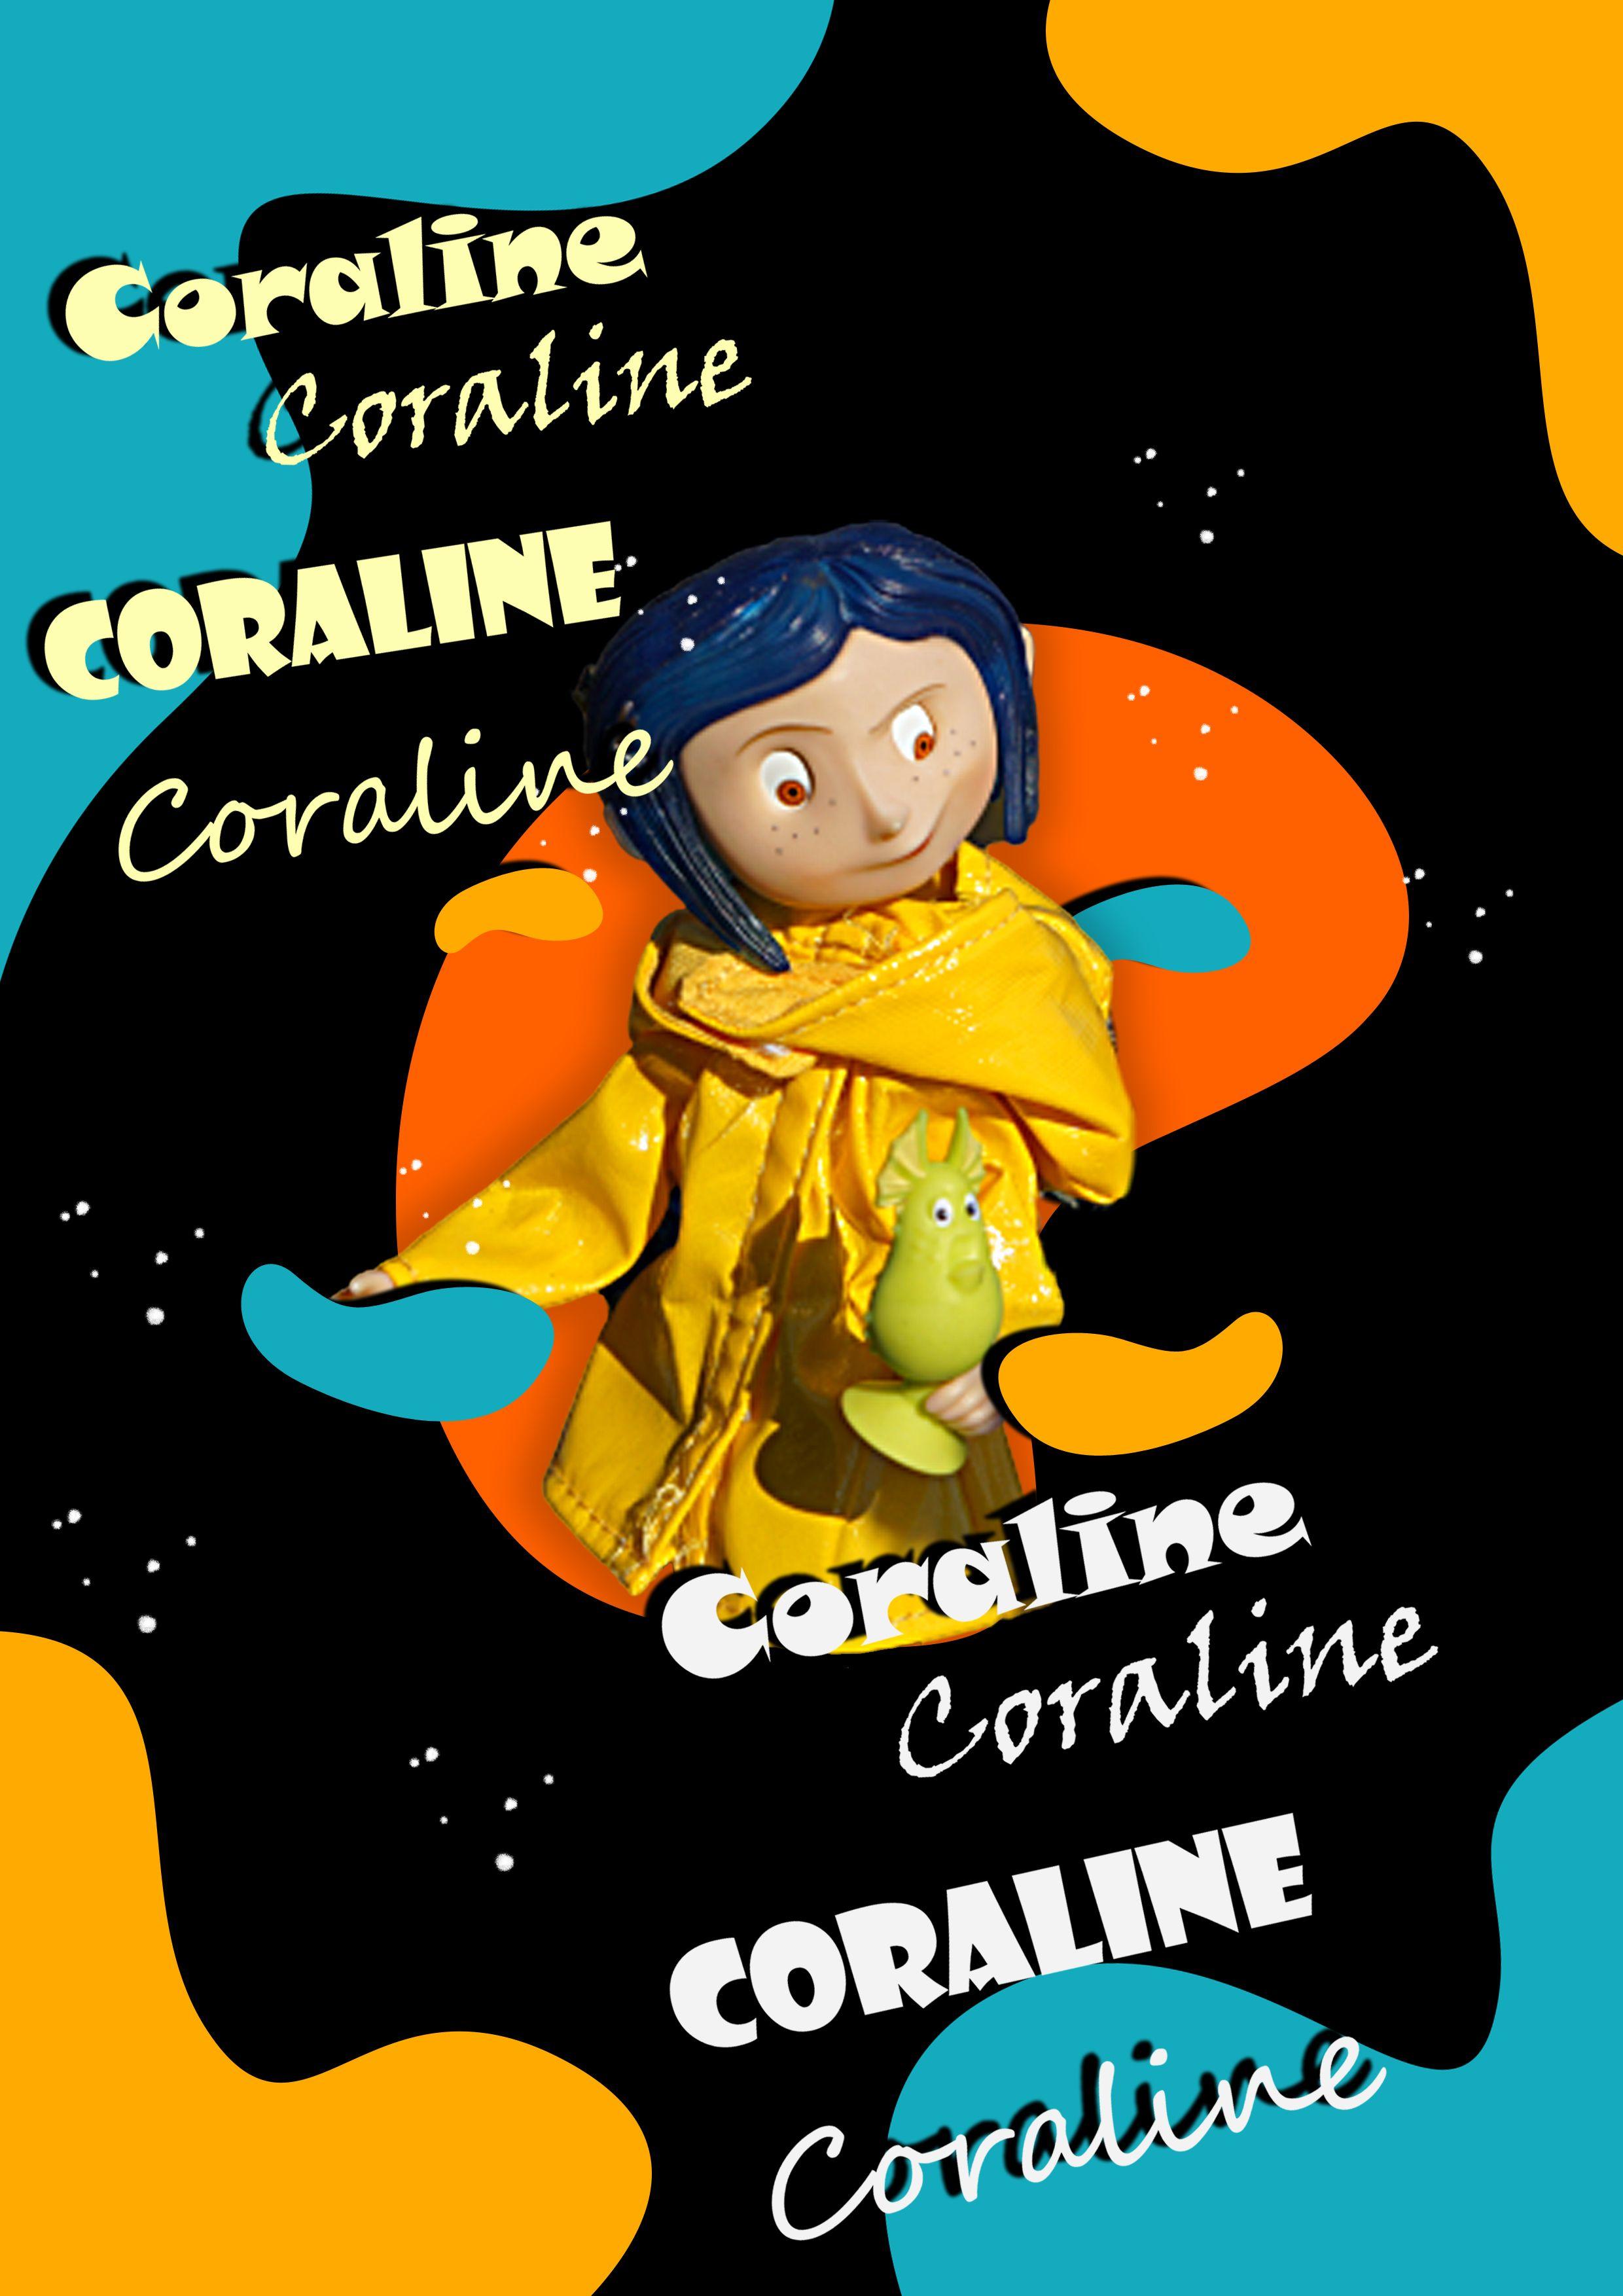 Coraline Art Illustrations Coraline Art Doll Digital Download Coraline Photo Coralina Art Tim Burton Gift Poster Coraline In 2020 Coraline Art Art Dolls Illustration Art